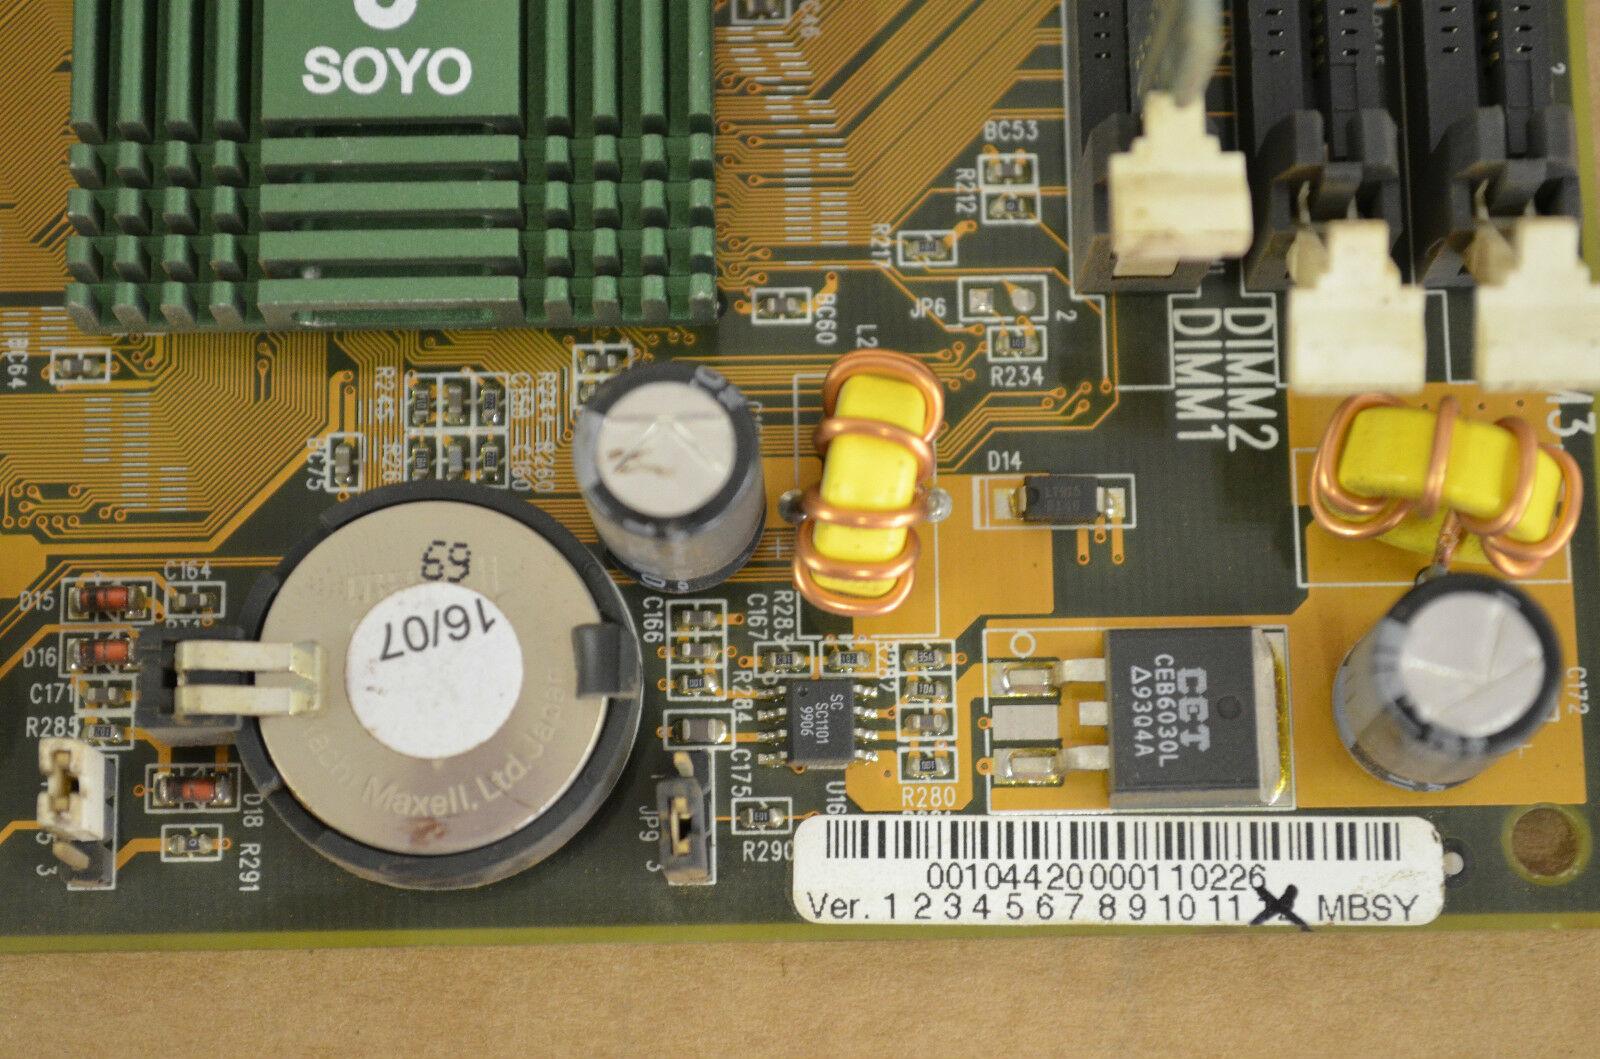 KUKA SY-71ZB+ Mainboard / Motherboard Industrieroboter  KRC1 KUKA SY-71ZB,Motherboard Industrieroboter,主板机器人